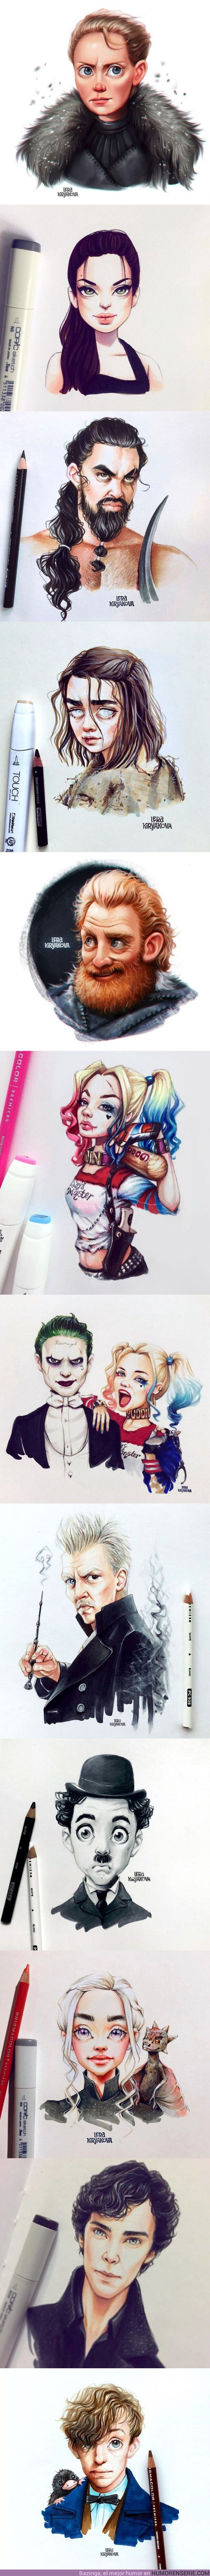 40872 - GALERÍA: Lera Kiryakova dibuja de forma increíble a tus personajes favoritos